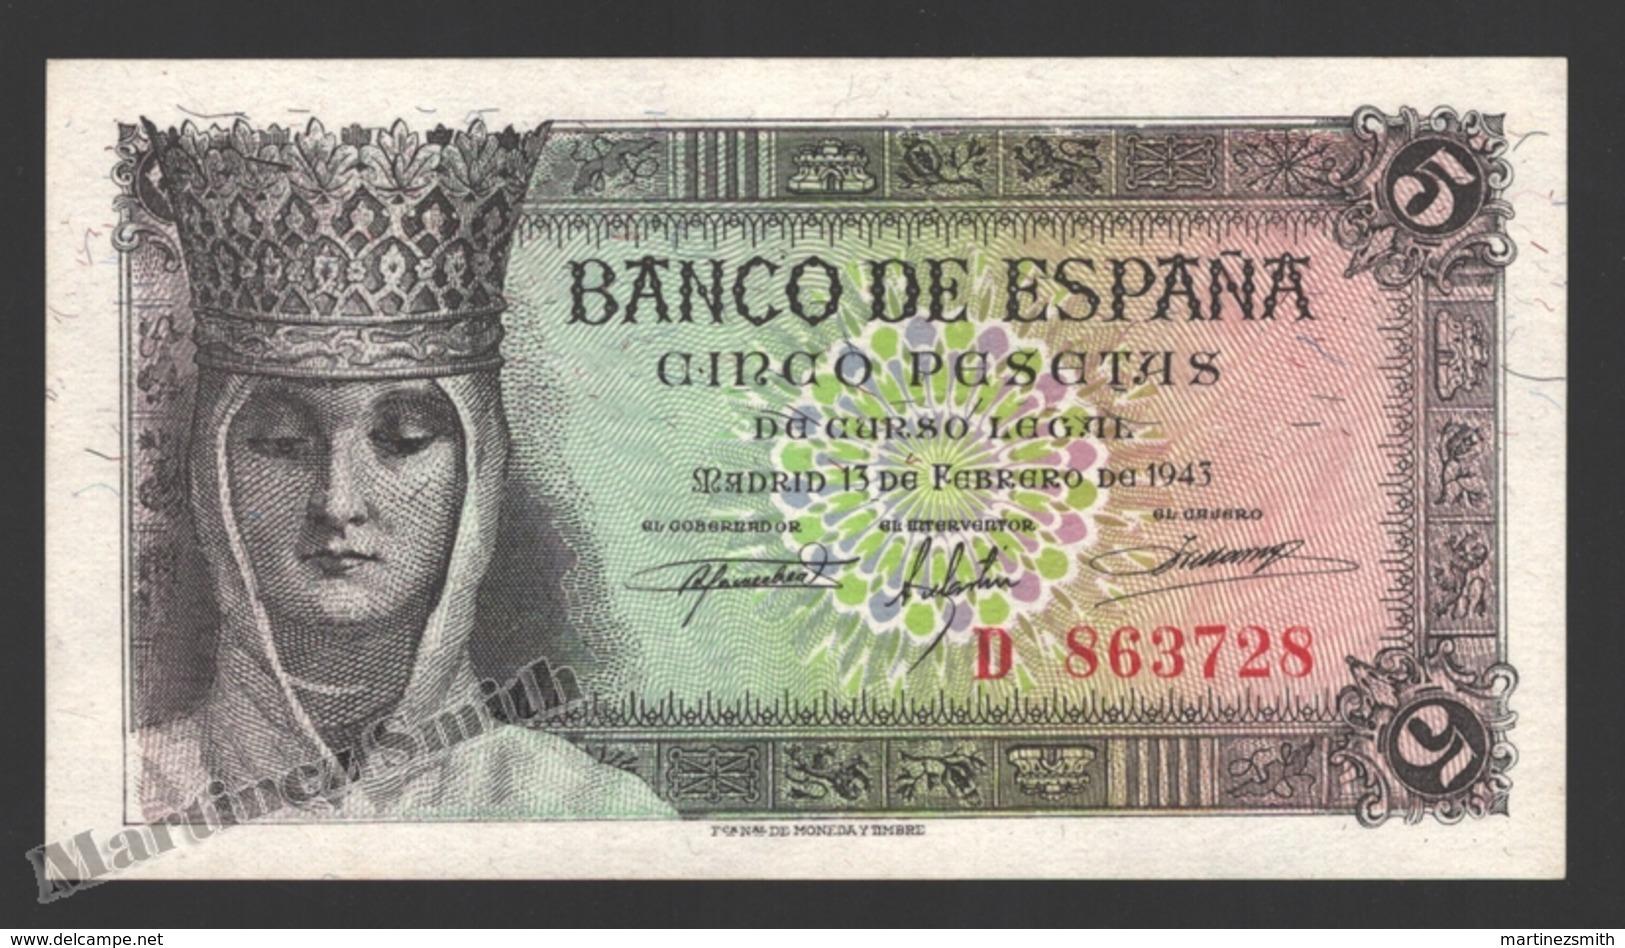 Banknote Spain -  5 Pesetas – February 1943 – Queen Isabel La Catolica - Condition VF - Pick 127 - 5 Pesetas